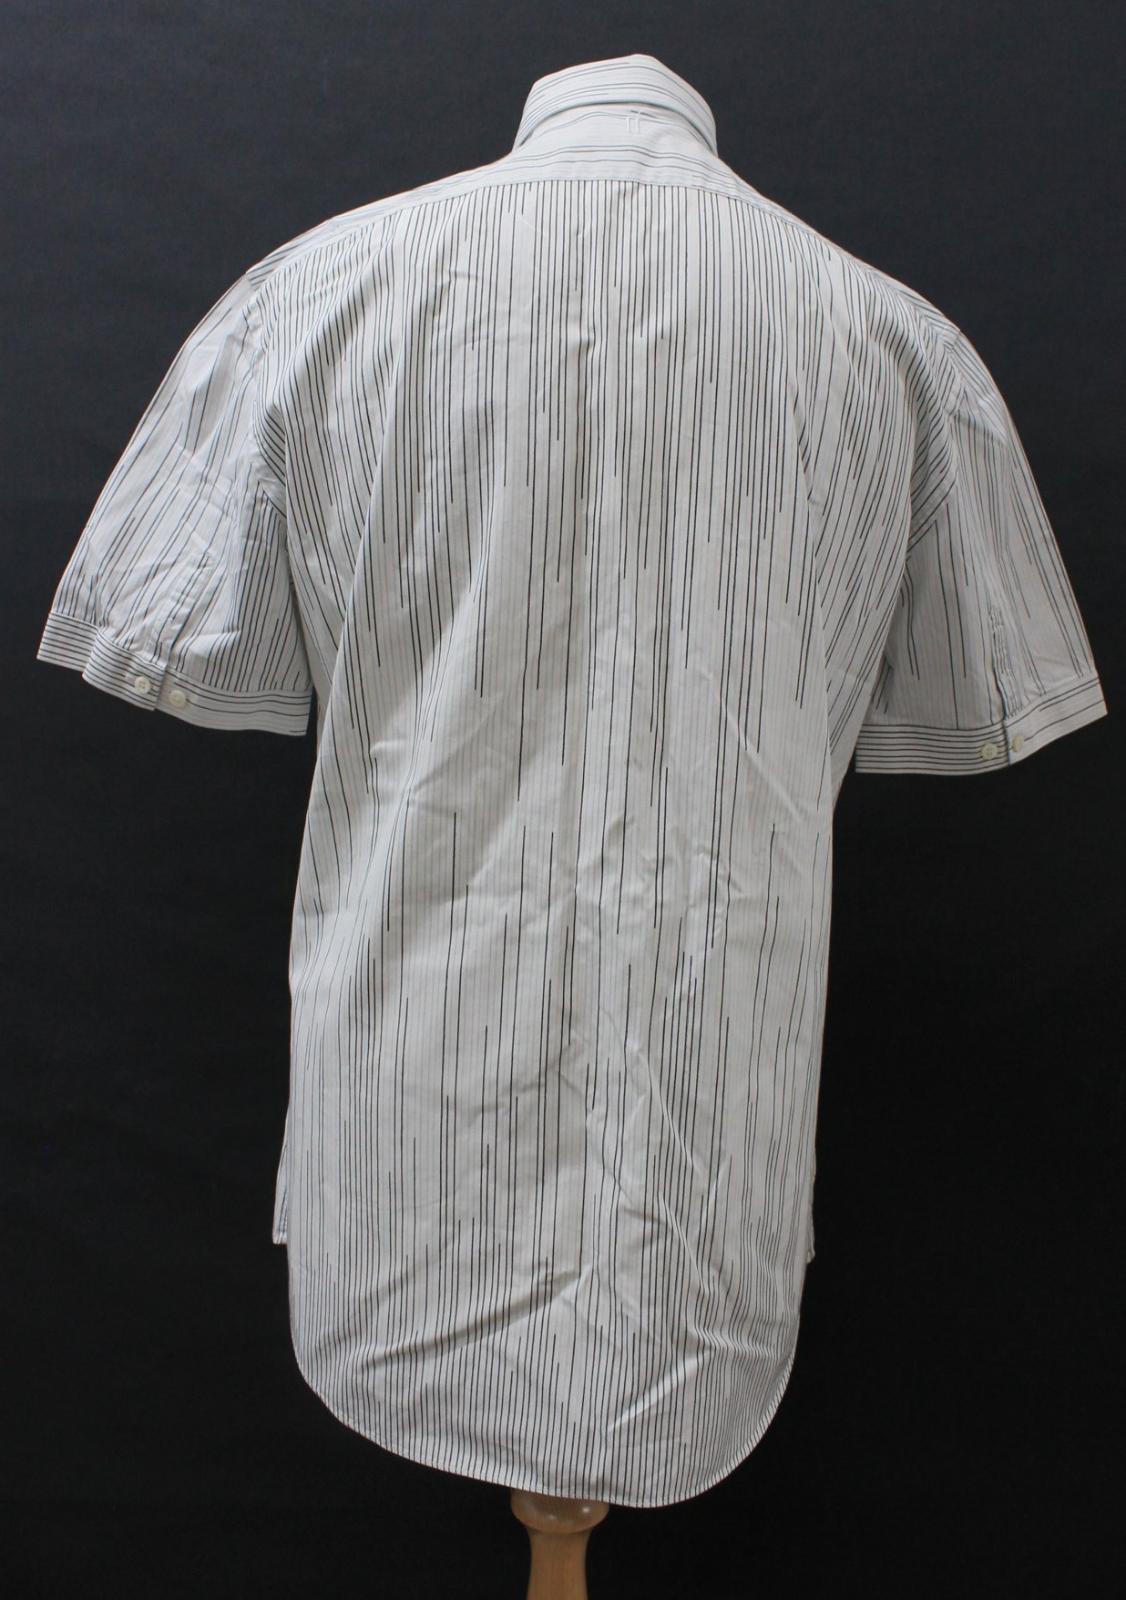 Neil-Barrett-Hombre-Blanco-Algodon-De-Rayas-Camisa-De-Manga-Corta-Estampado-de-bolsillo-16-5-034 miniatura 6